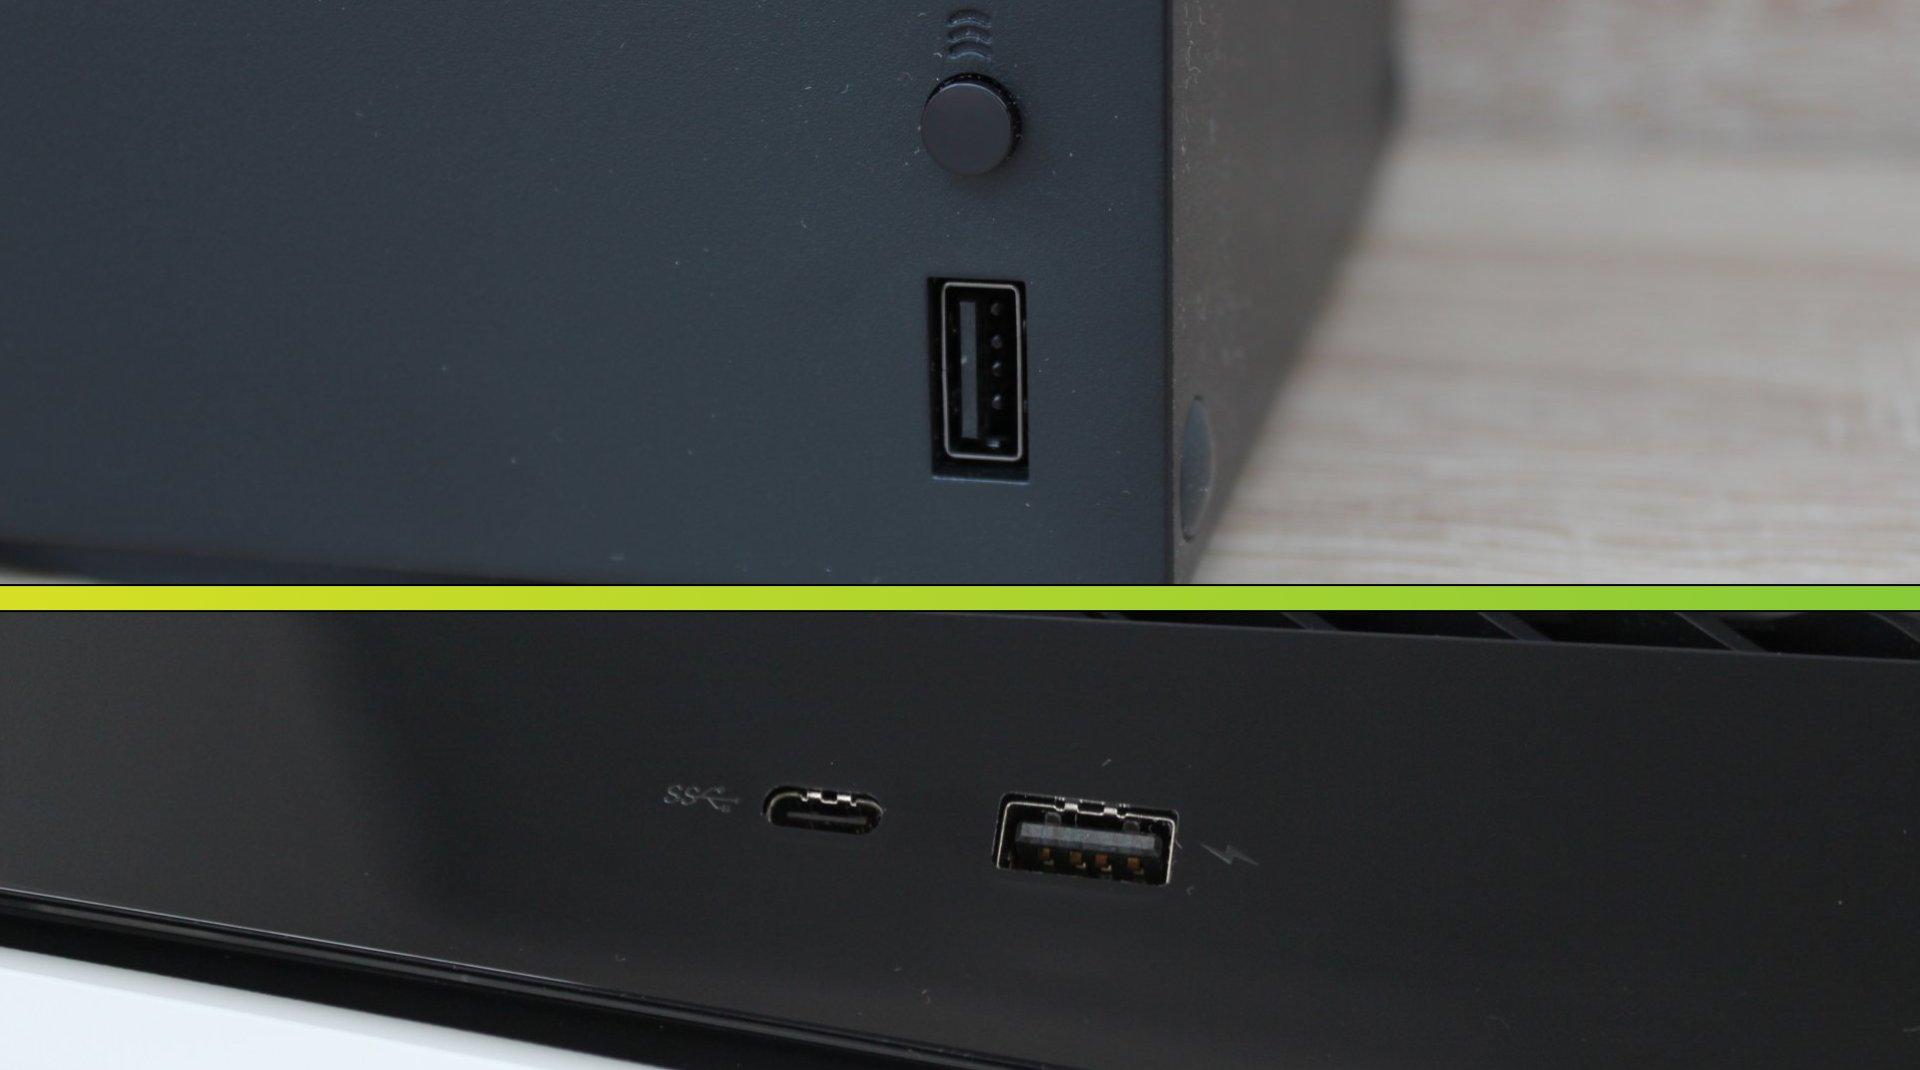 Xbox Series X má vpredu len jeden USB 3.1. PlayStation 5 zase USB 2.0 a USB typu C.